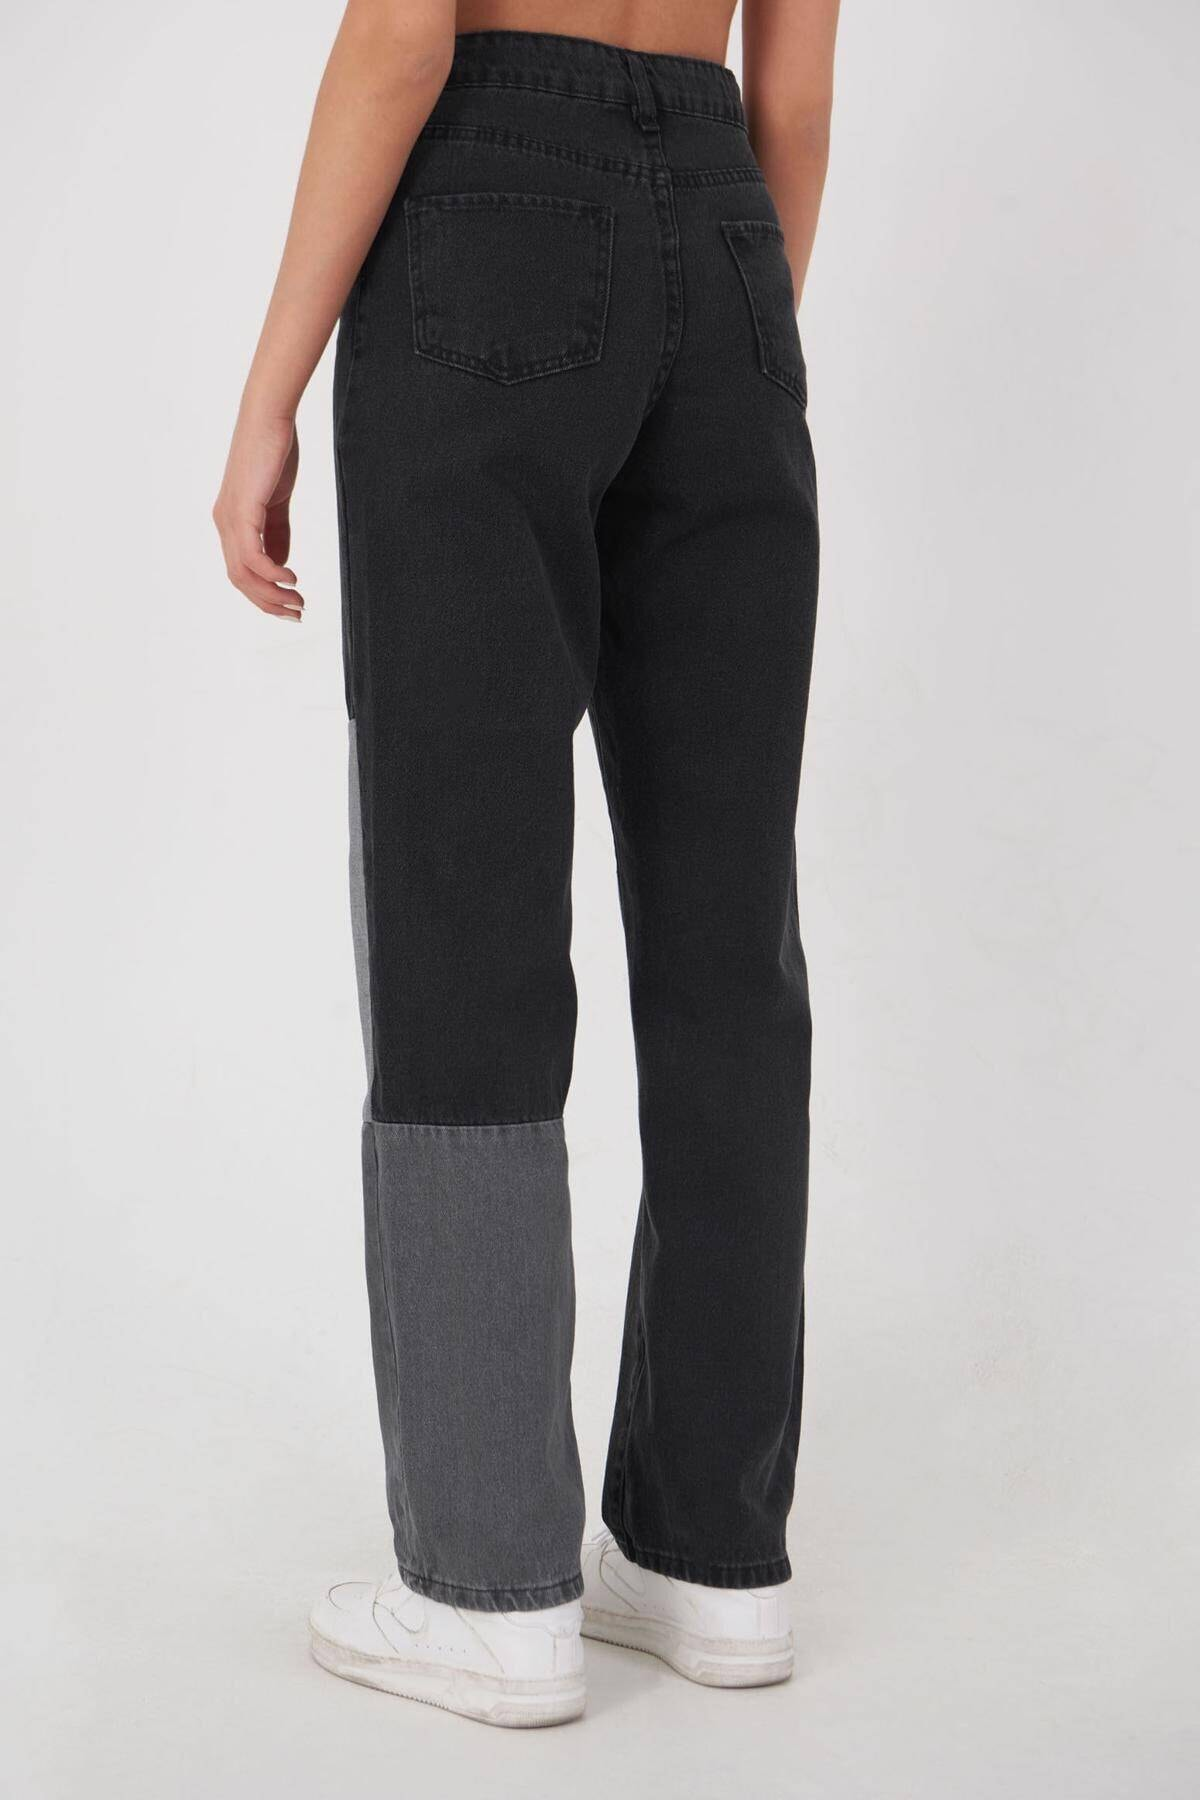 Addax Kadın Antrasit Gri Cep Detaylı Pantolon Pn1153 - Pnd Adx-0000023940